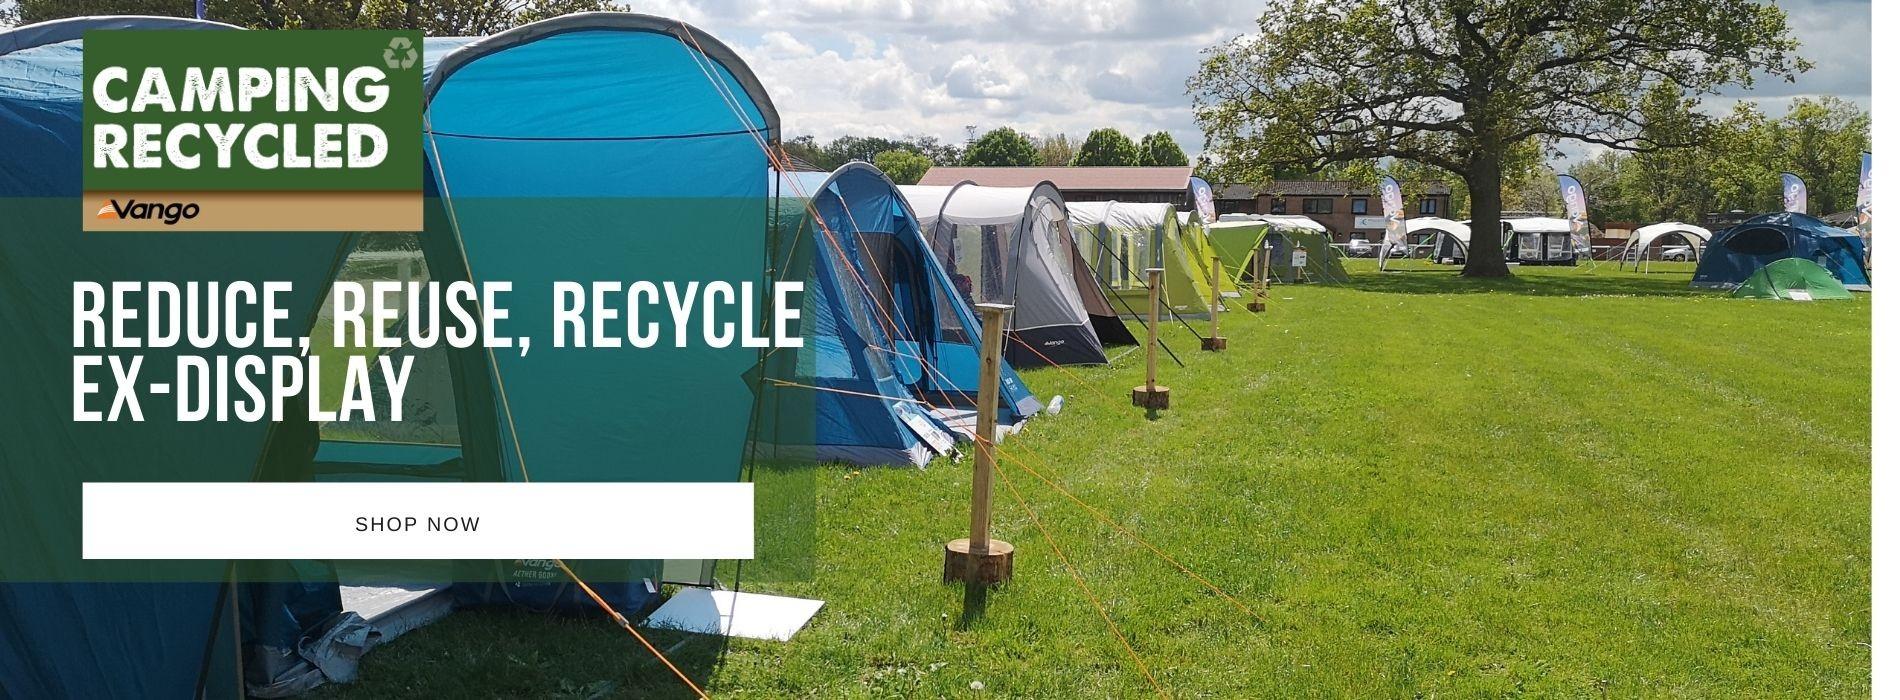 Ex-Display Tents